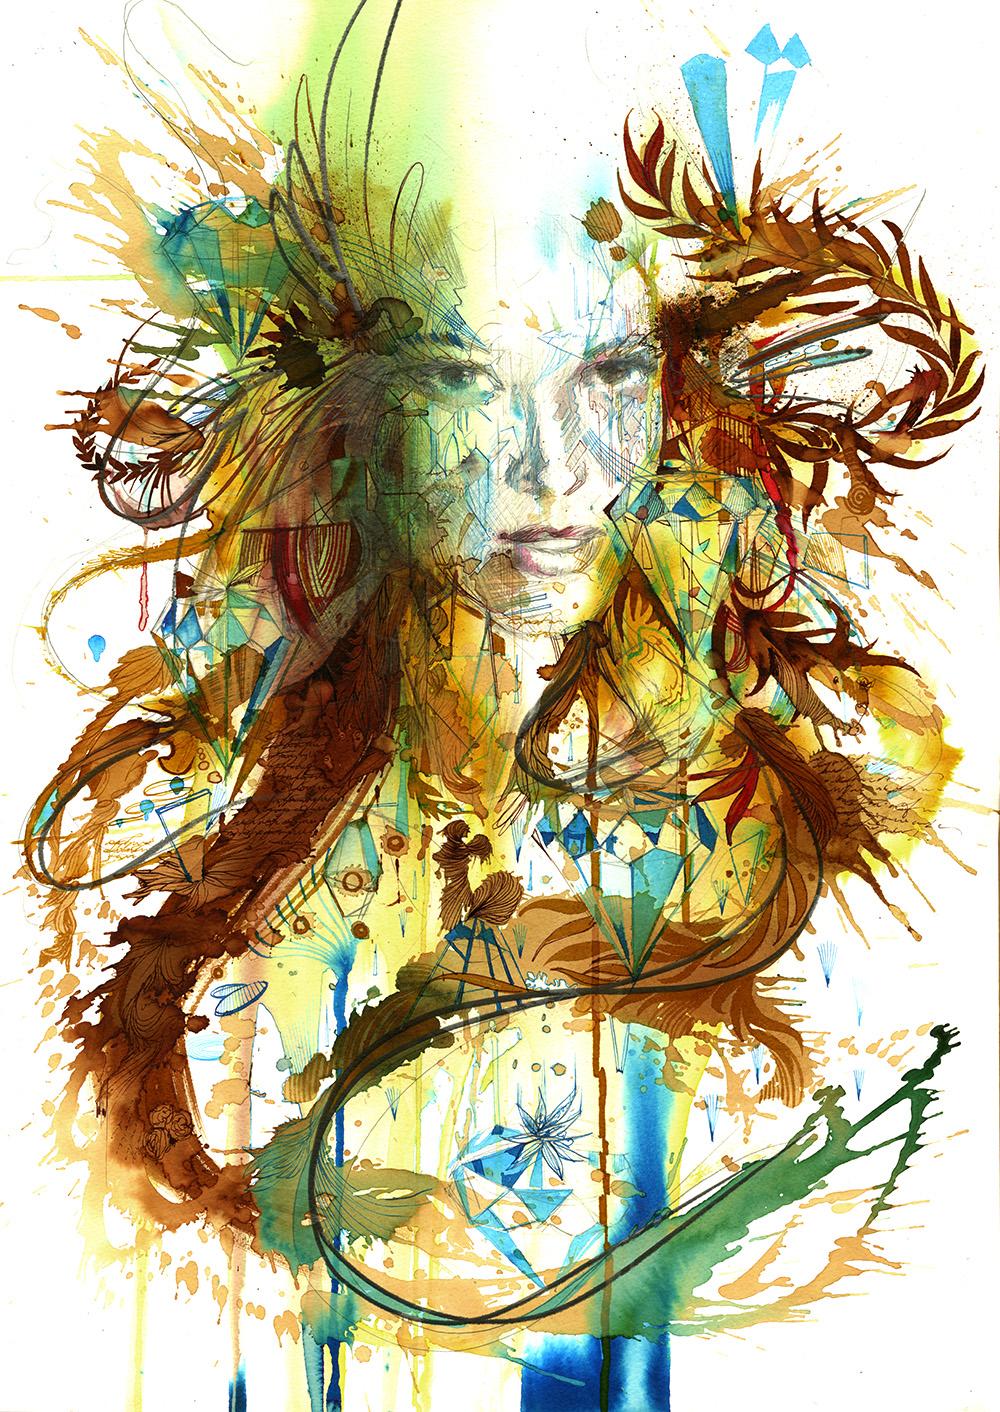 Carne Griffiths - Alternative Watercolours!